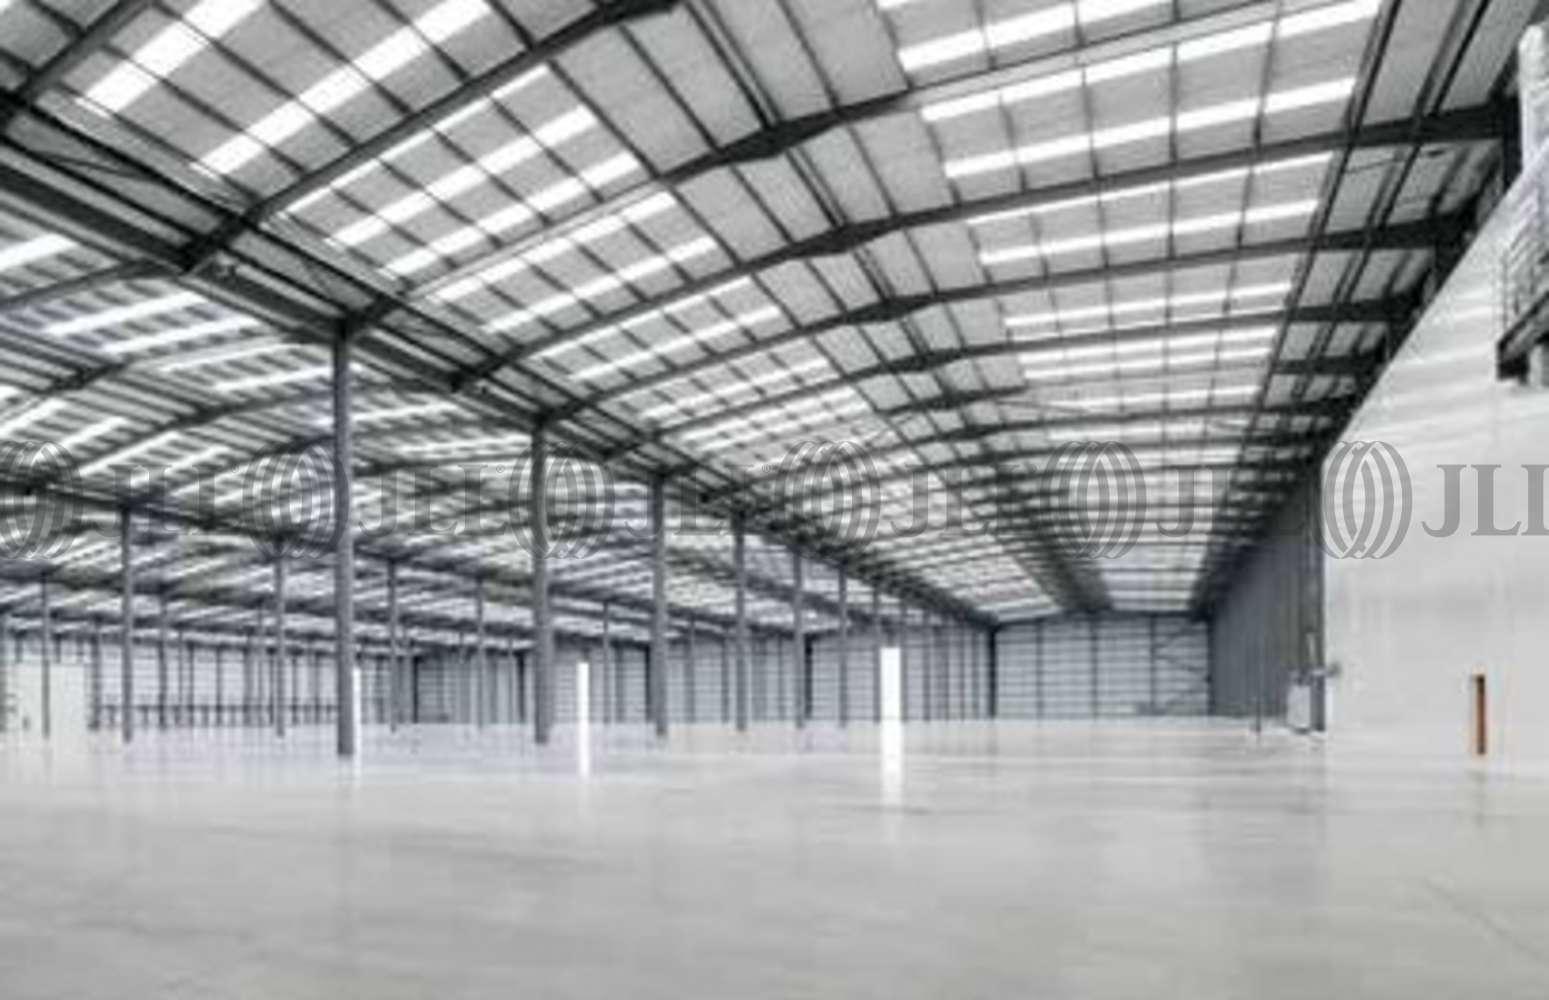 Industrial Bolton, BL5 1DB - 375 at Logistics North - 2